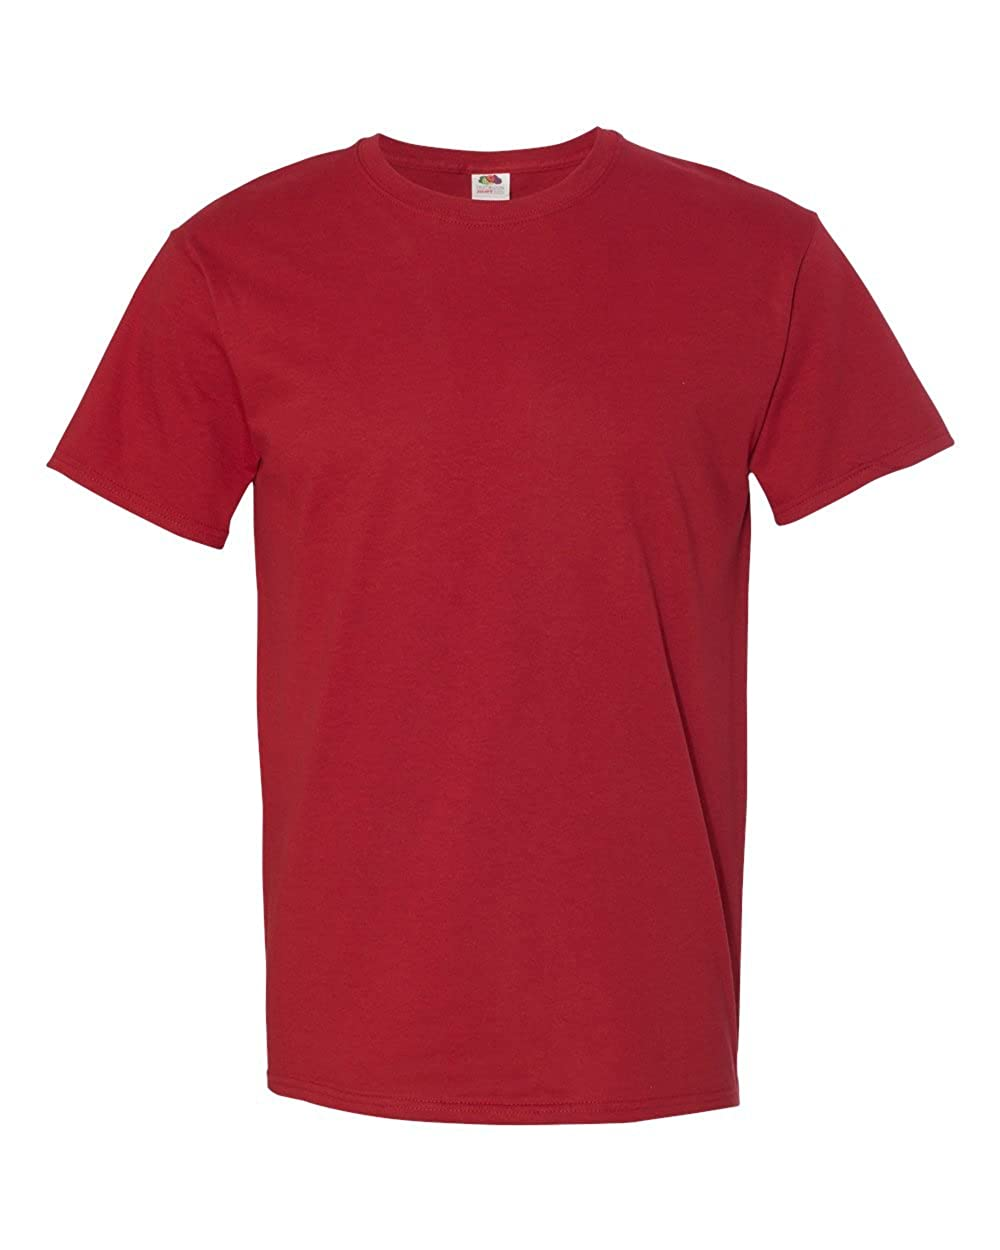 S 3931 Crimson Fruit of the Loom 5 oz 100/% Heavy Cotton HD T-Shirt